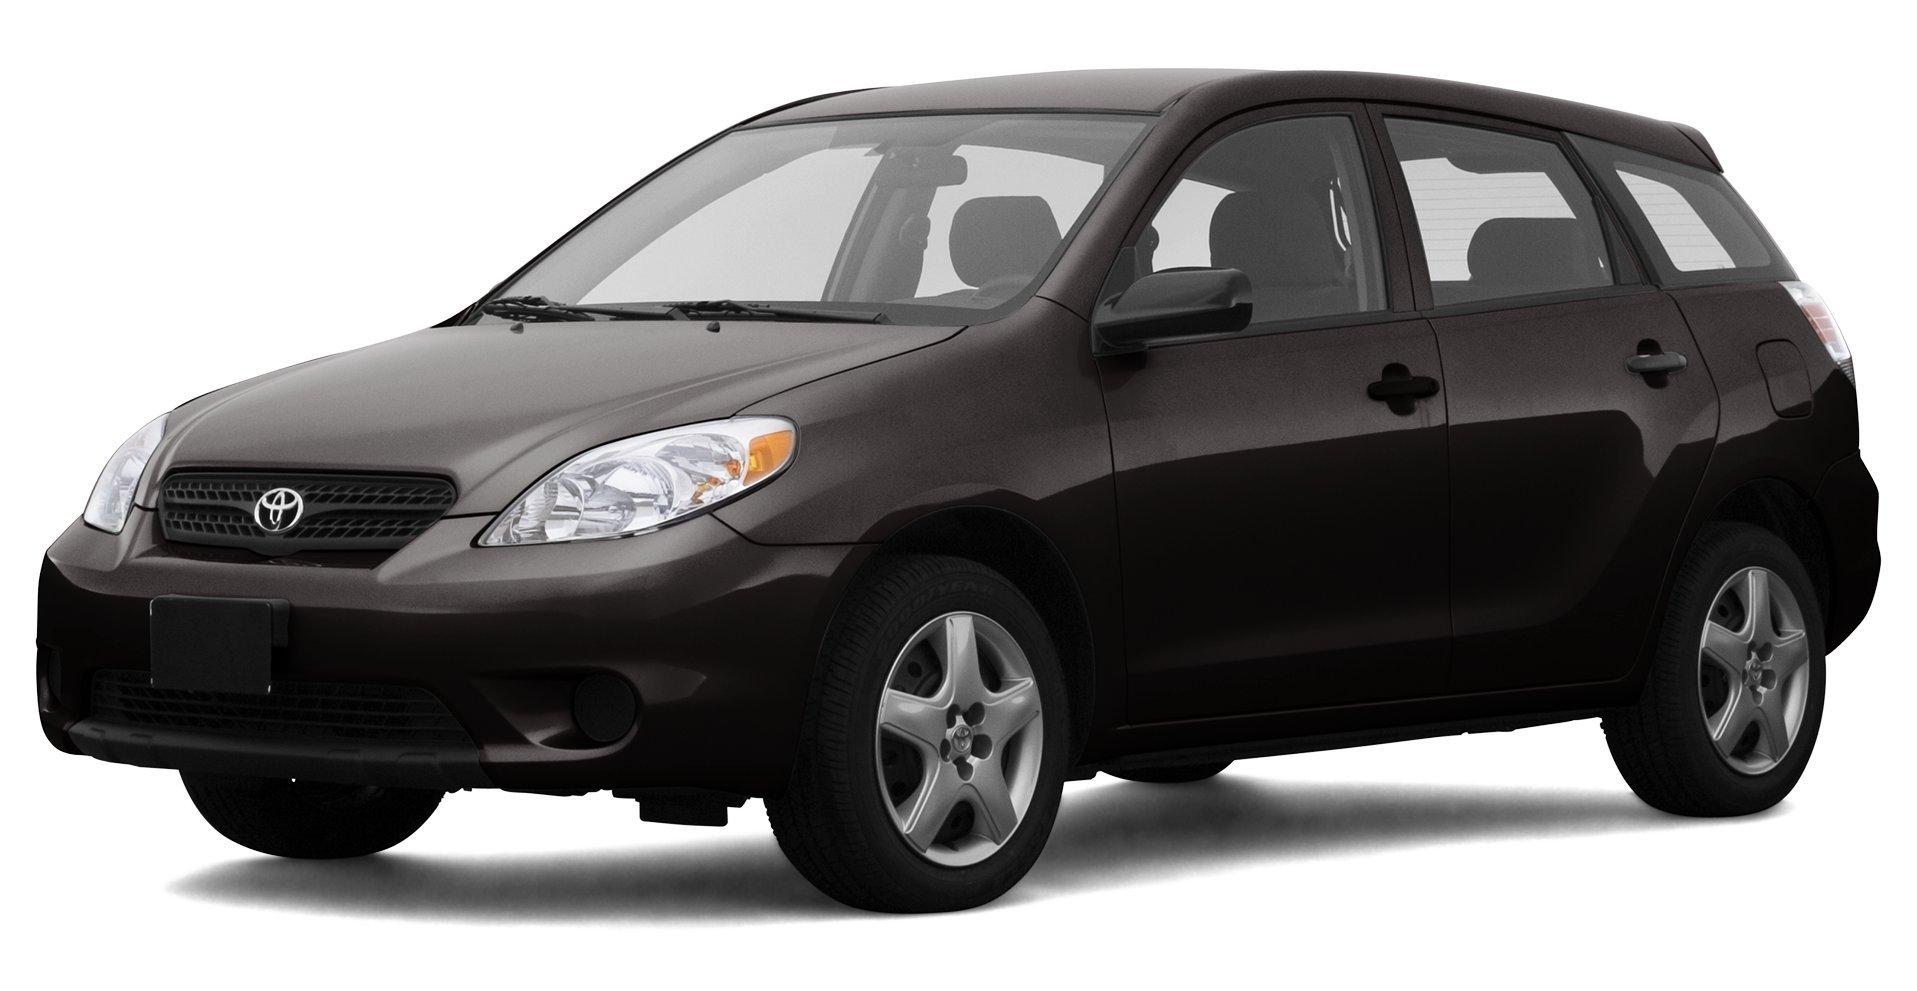 2004 toyota matrix automatic transmission problems